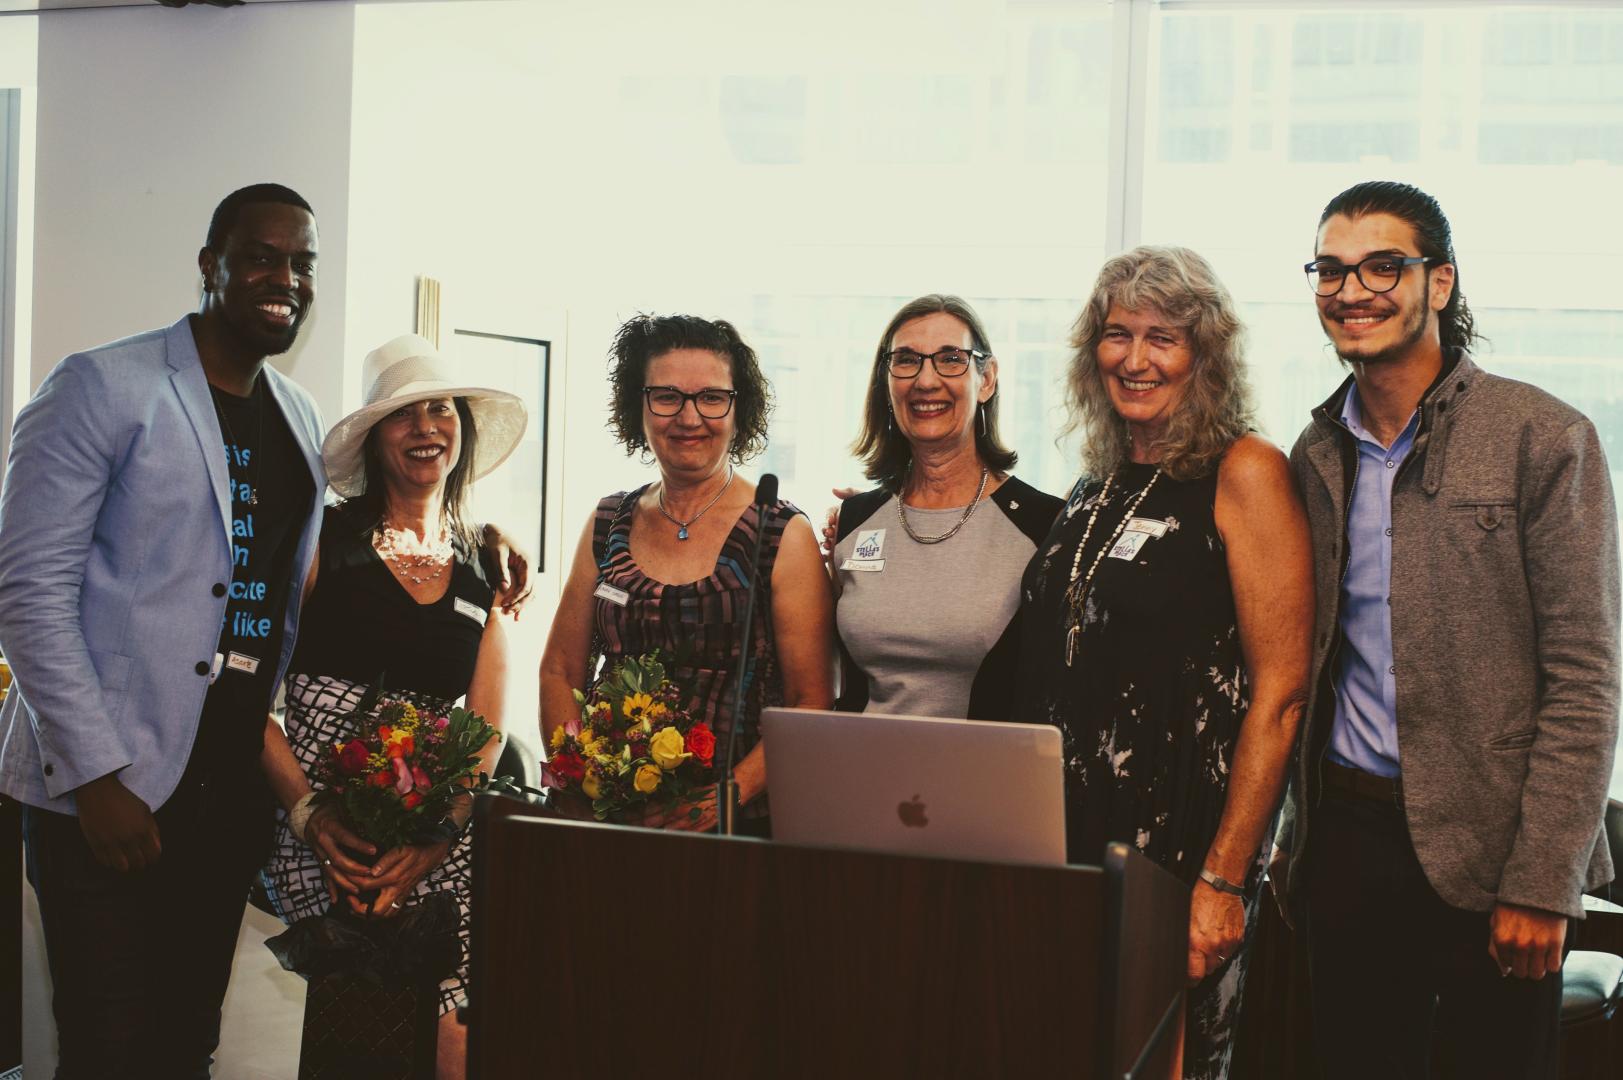 Celebrating Transformational Philanthropists Left to Right: Asante Haughton, Lindy Green, Karen Green, Donna Green, Jenny Carver & Tarek Kadan